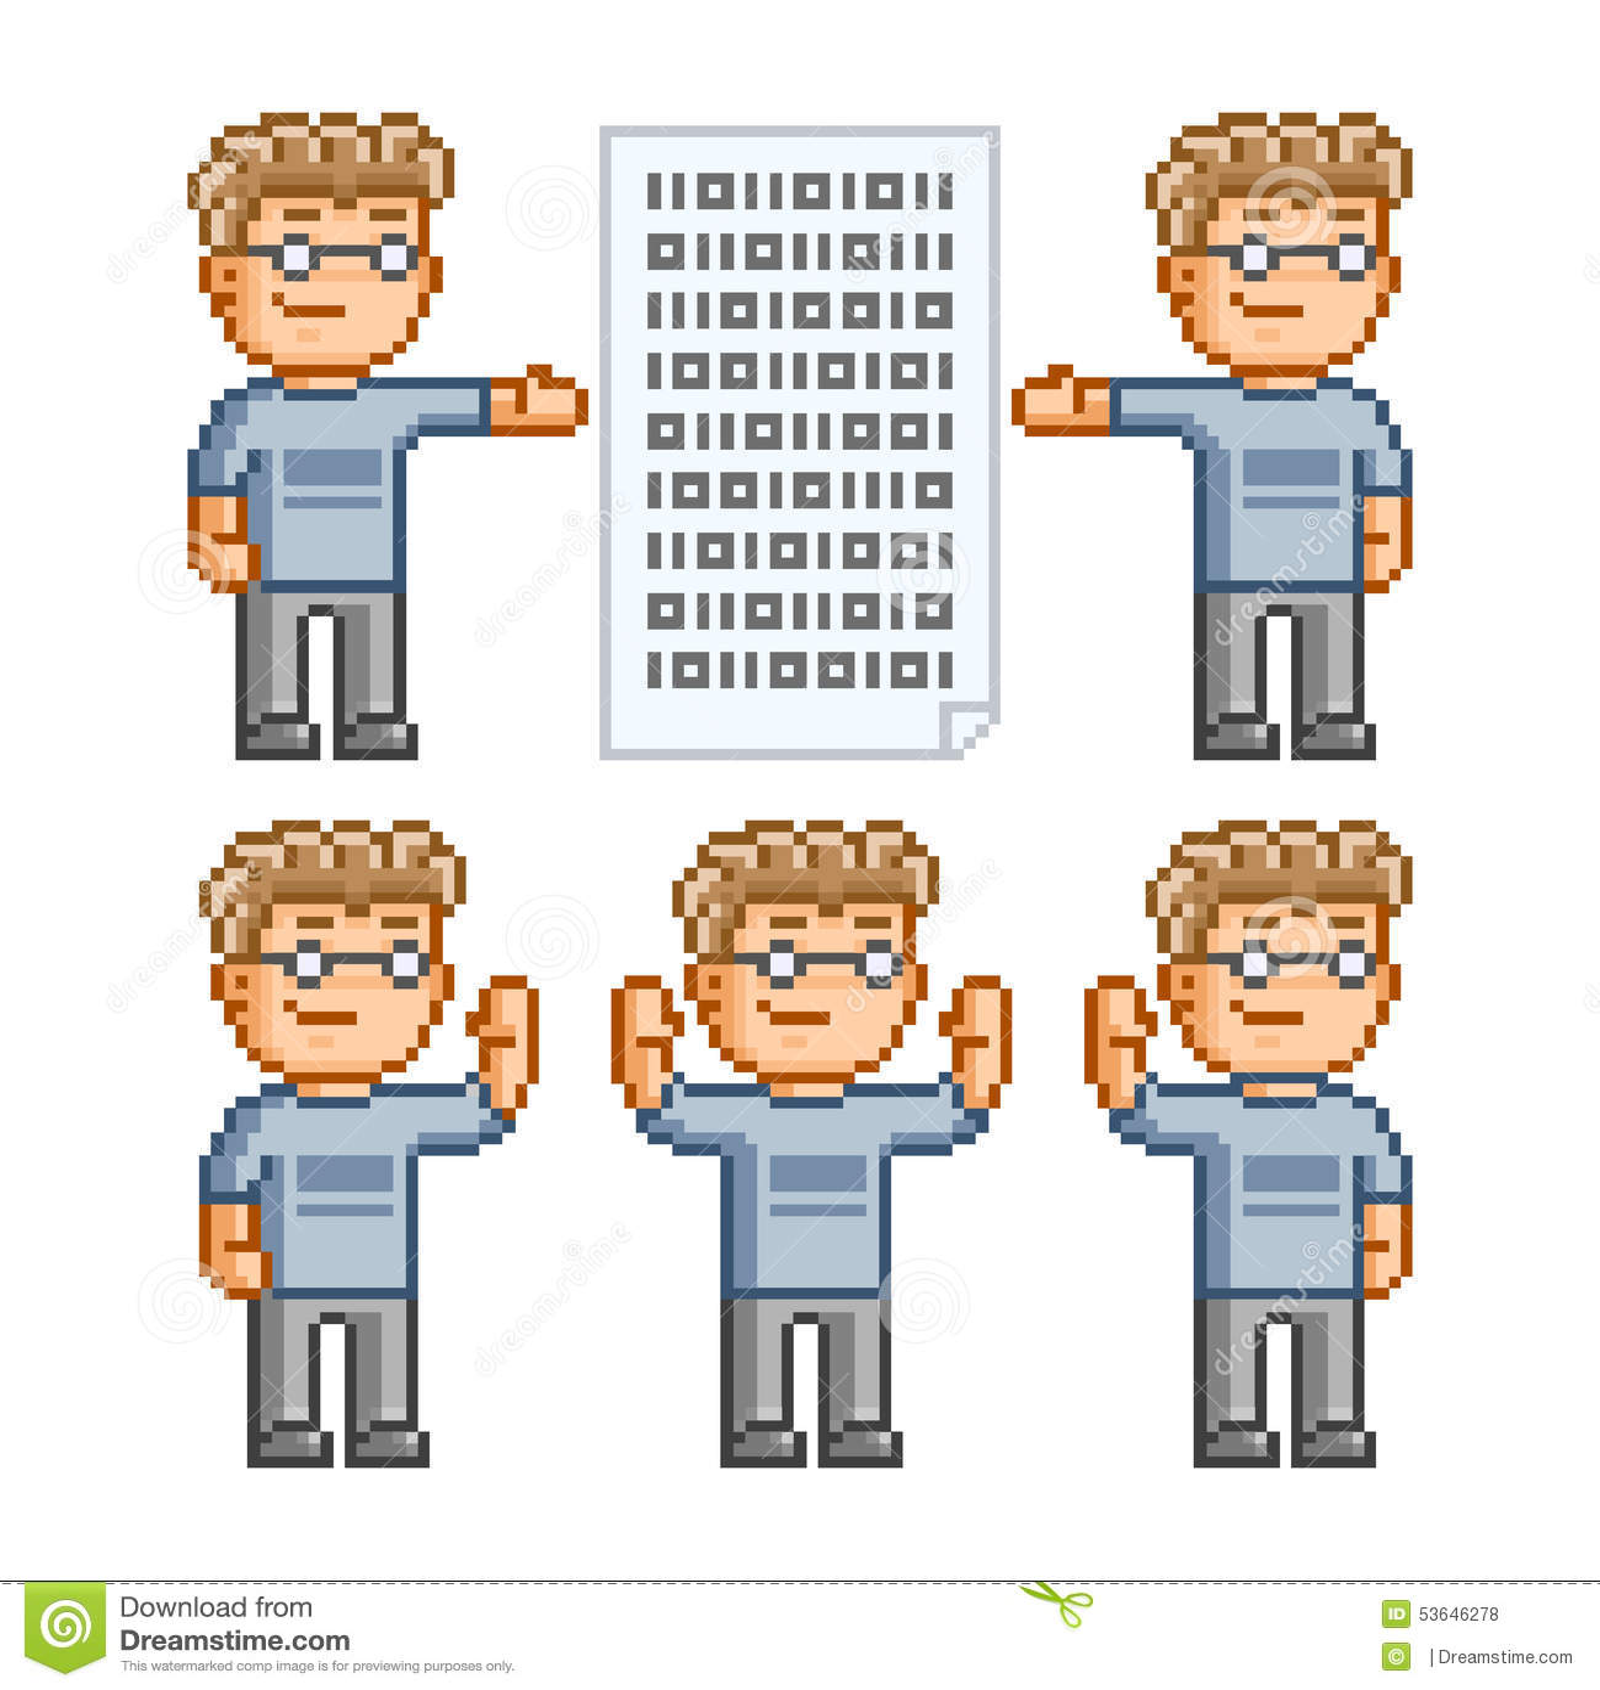 pixel art for programmers